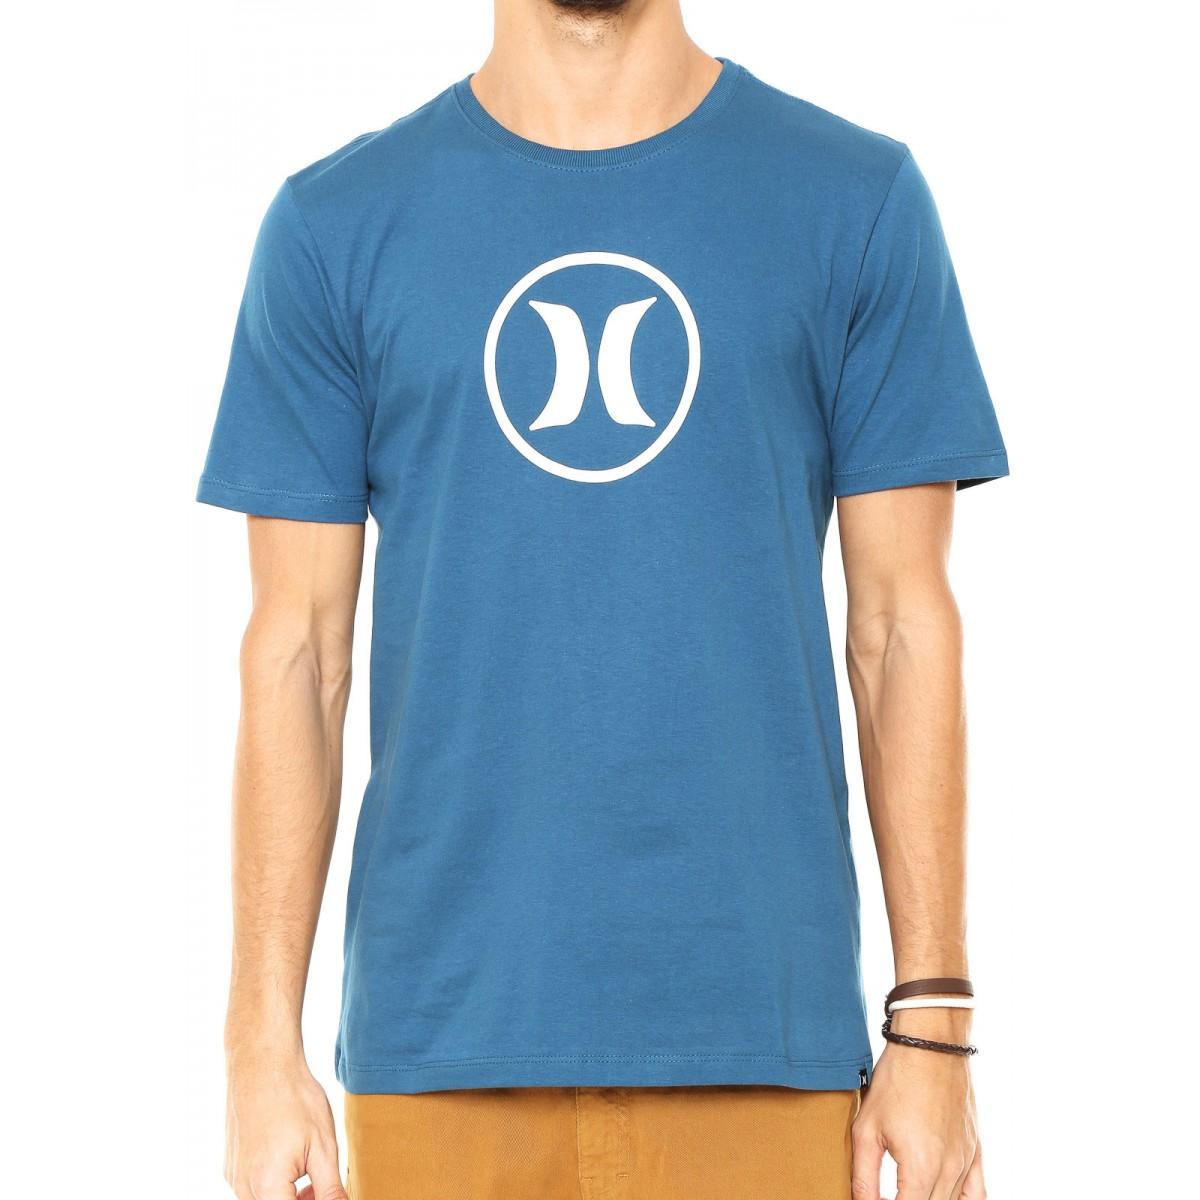 ... Camiseta Hurley Circle Icon Masculina - Azul ... a681b3c998c